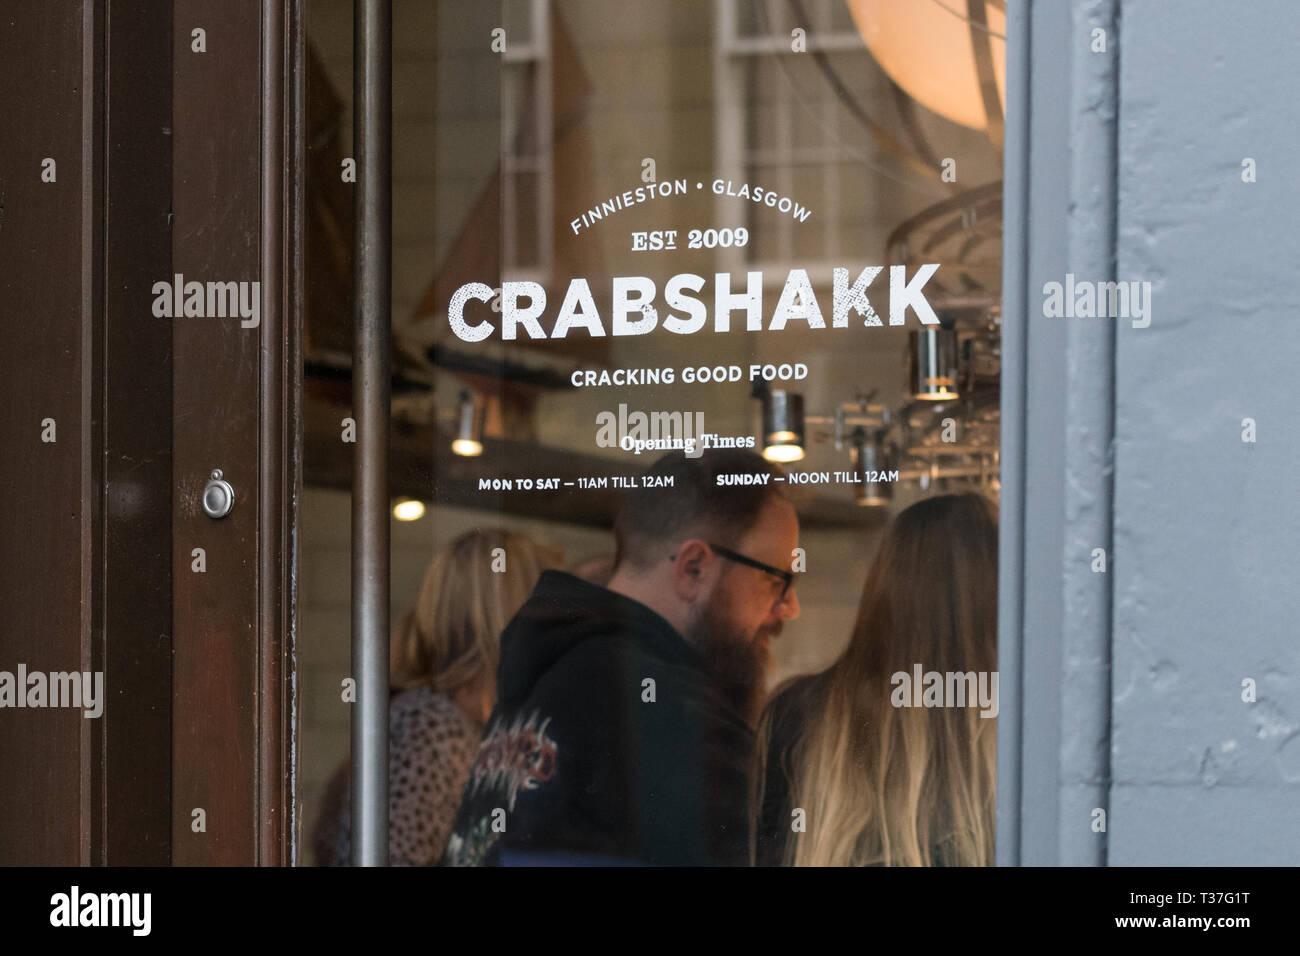 Crabshakk seafood and fish restaurant, Argyle Street, Finnieston, Glasgow, Scotland, UK Stock Photo